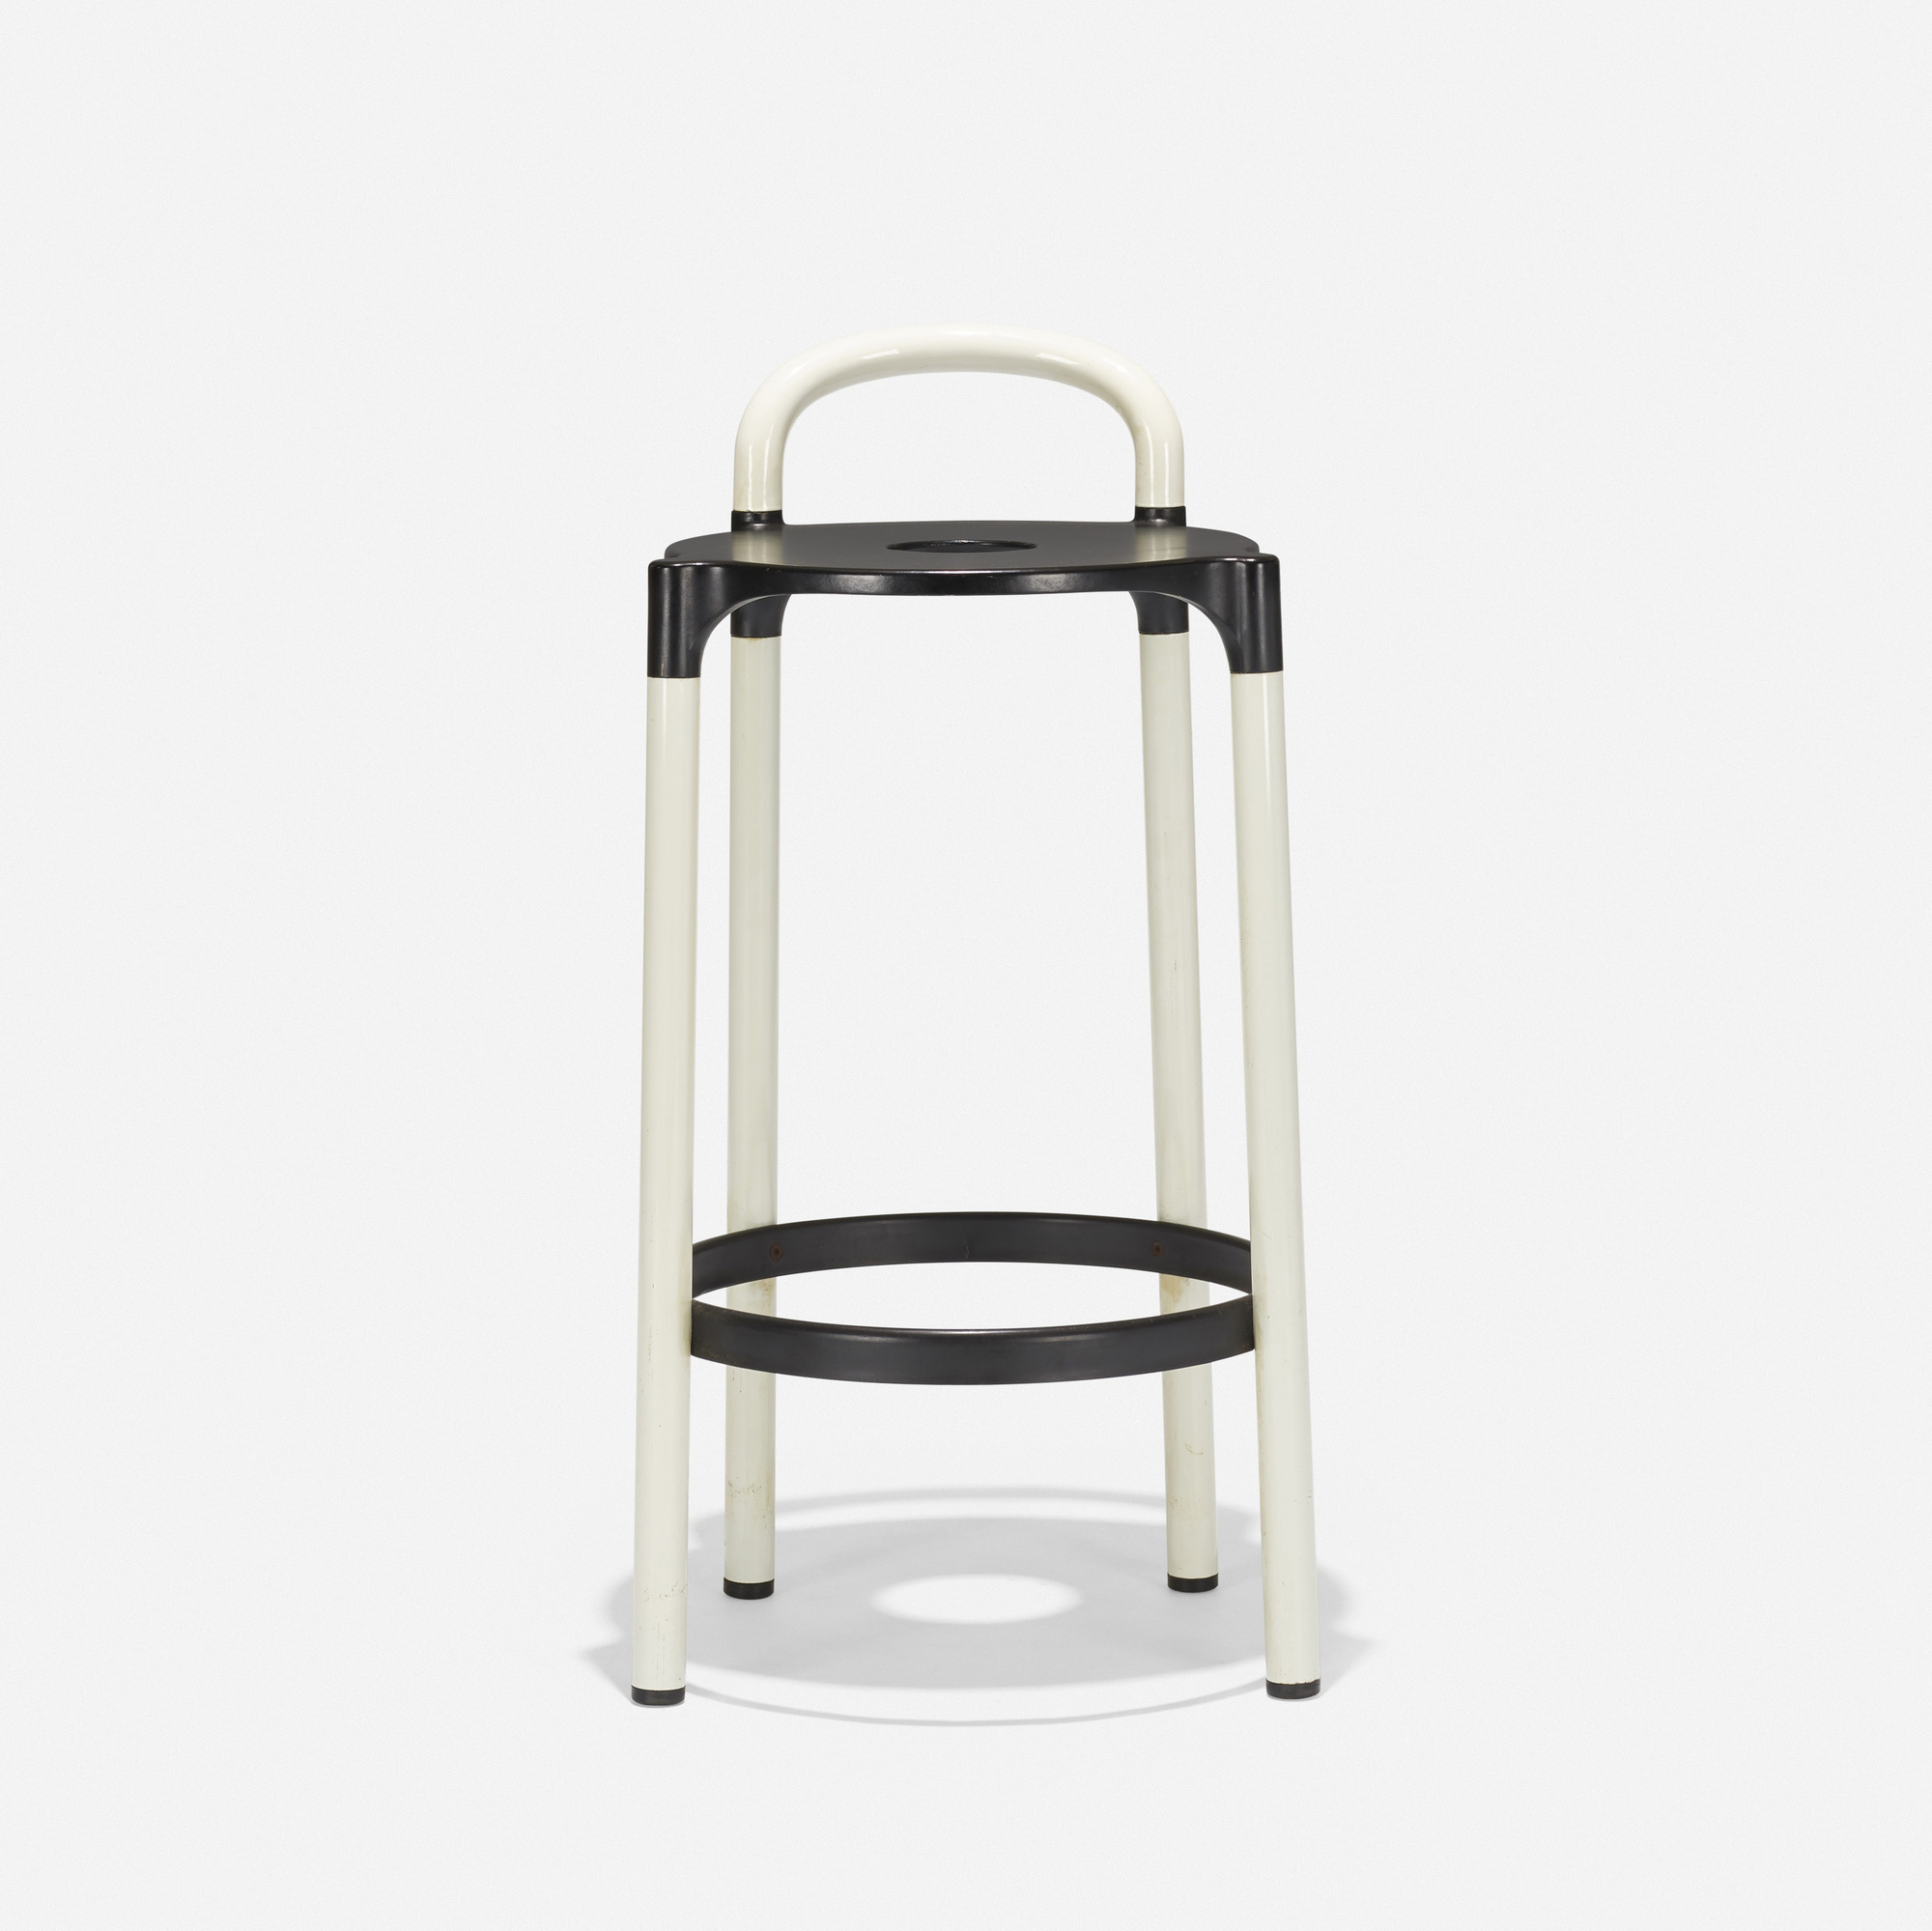 416: Anna Castelli / bar stool, model 4823 (2 of 3)